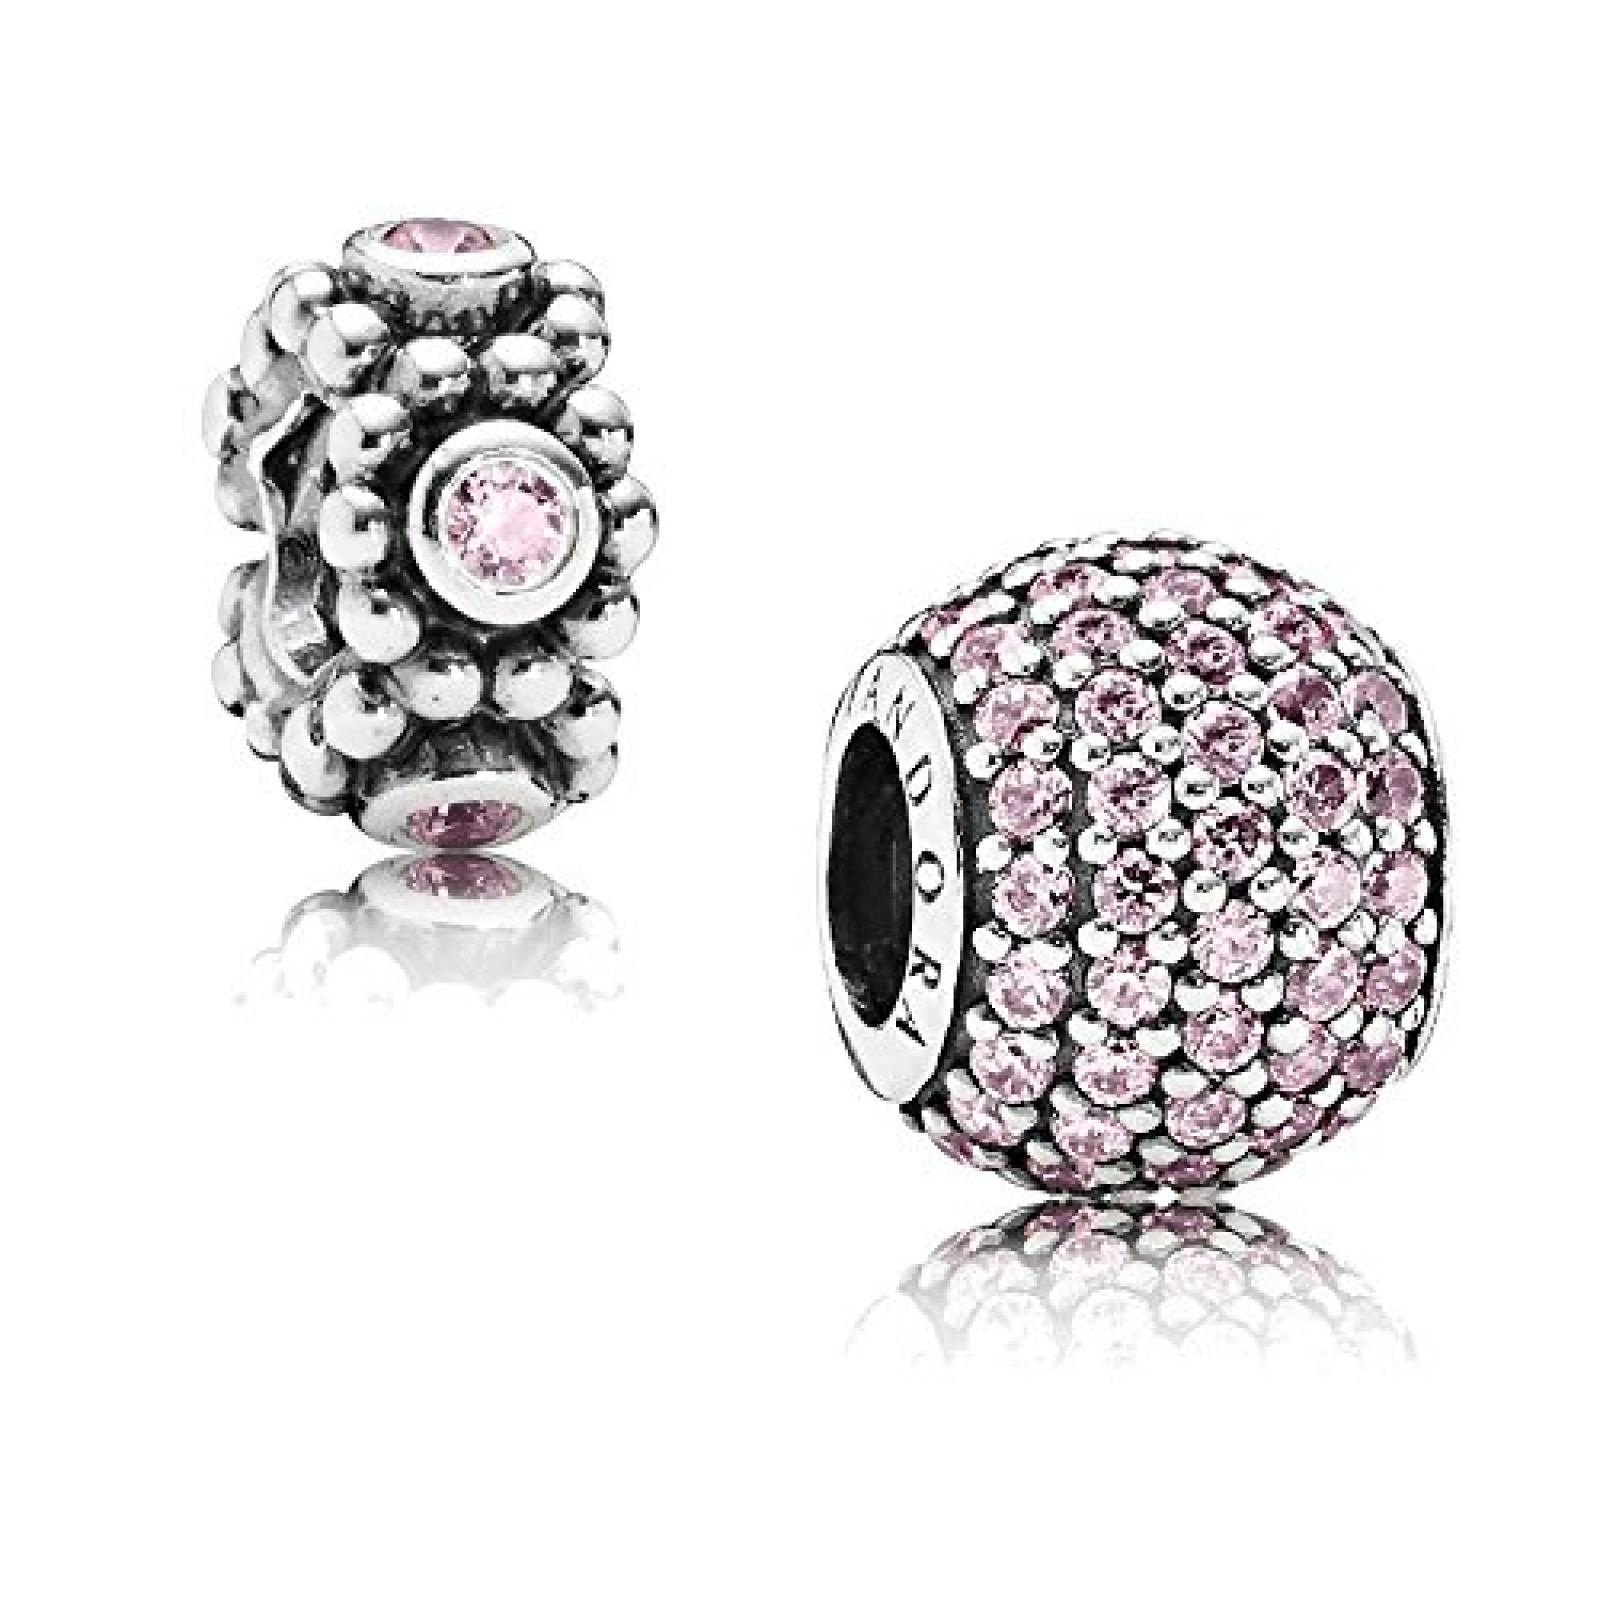 Original Pandora Geschenkset - 1 Silber Element Pavé Kugel mit rosafarbenem Zirkonia 791051PCZ und 1 Silber Zwischenelement Rosa Kreise mit rosafarbenem Zirkonia 791122PCZ